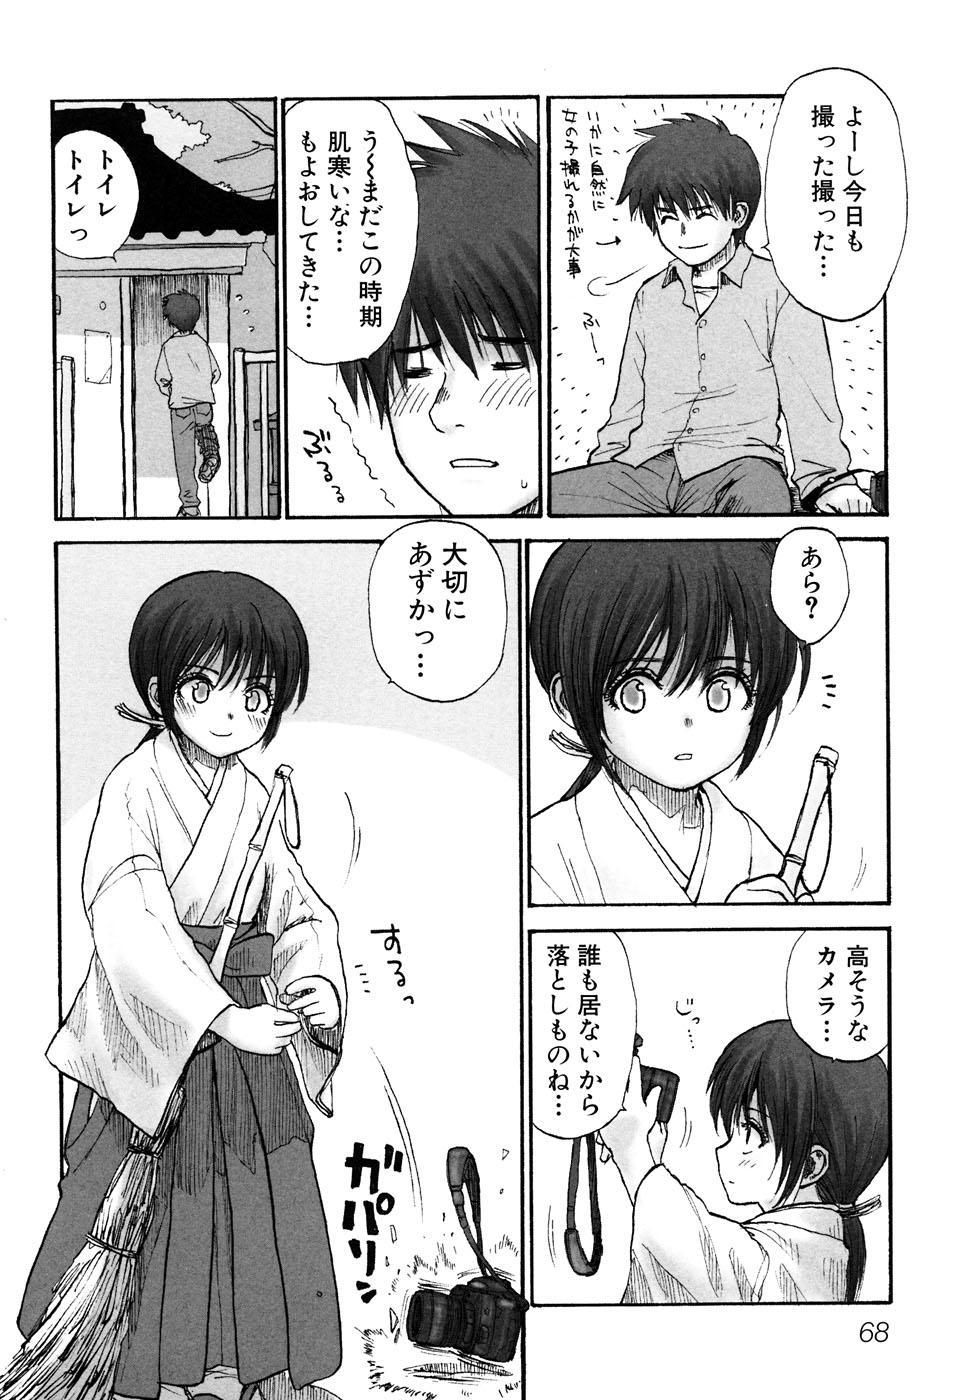 Fechikko VS Series ROUND.2 Miko San VS Maid San 70